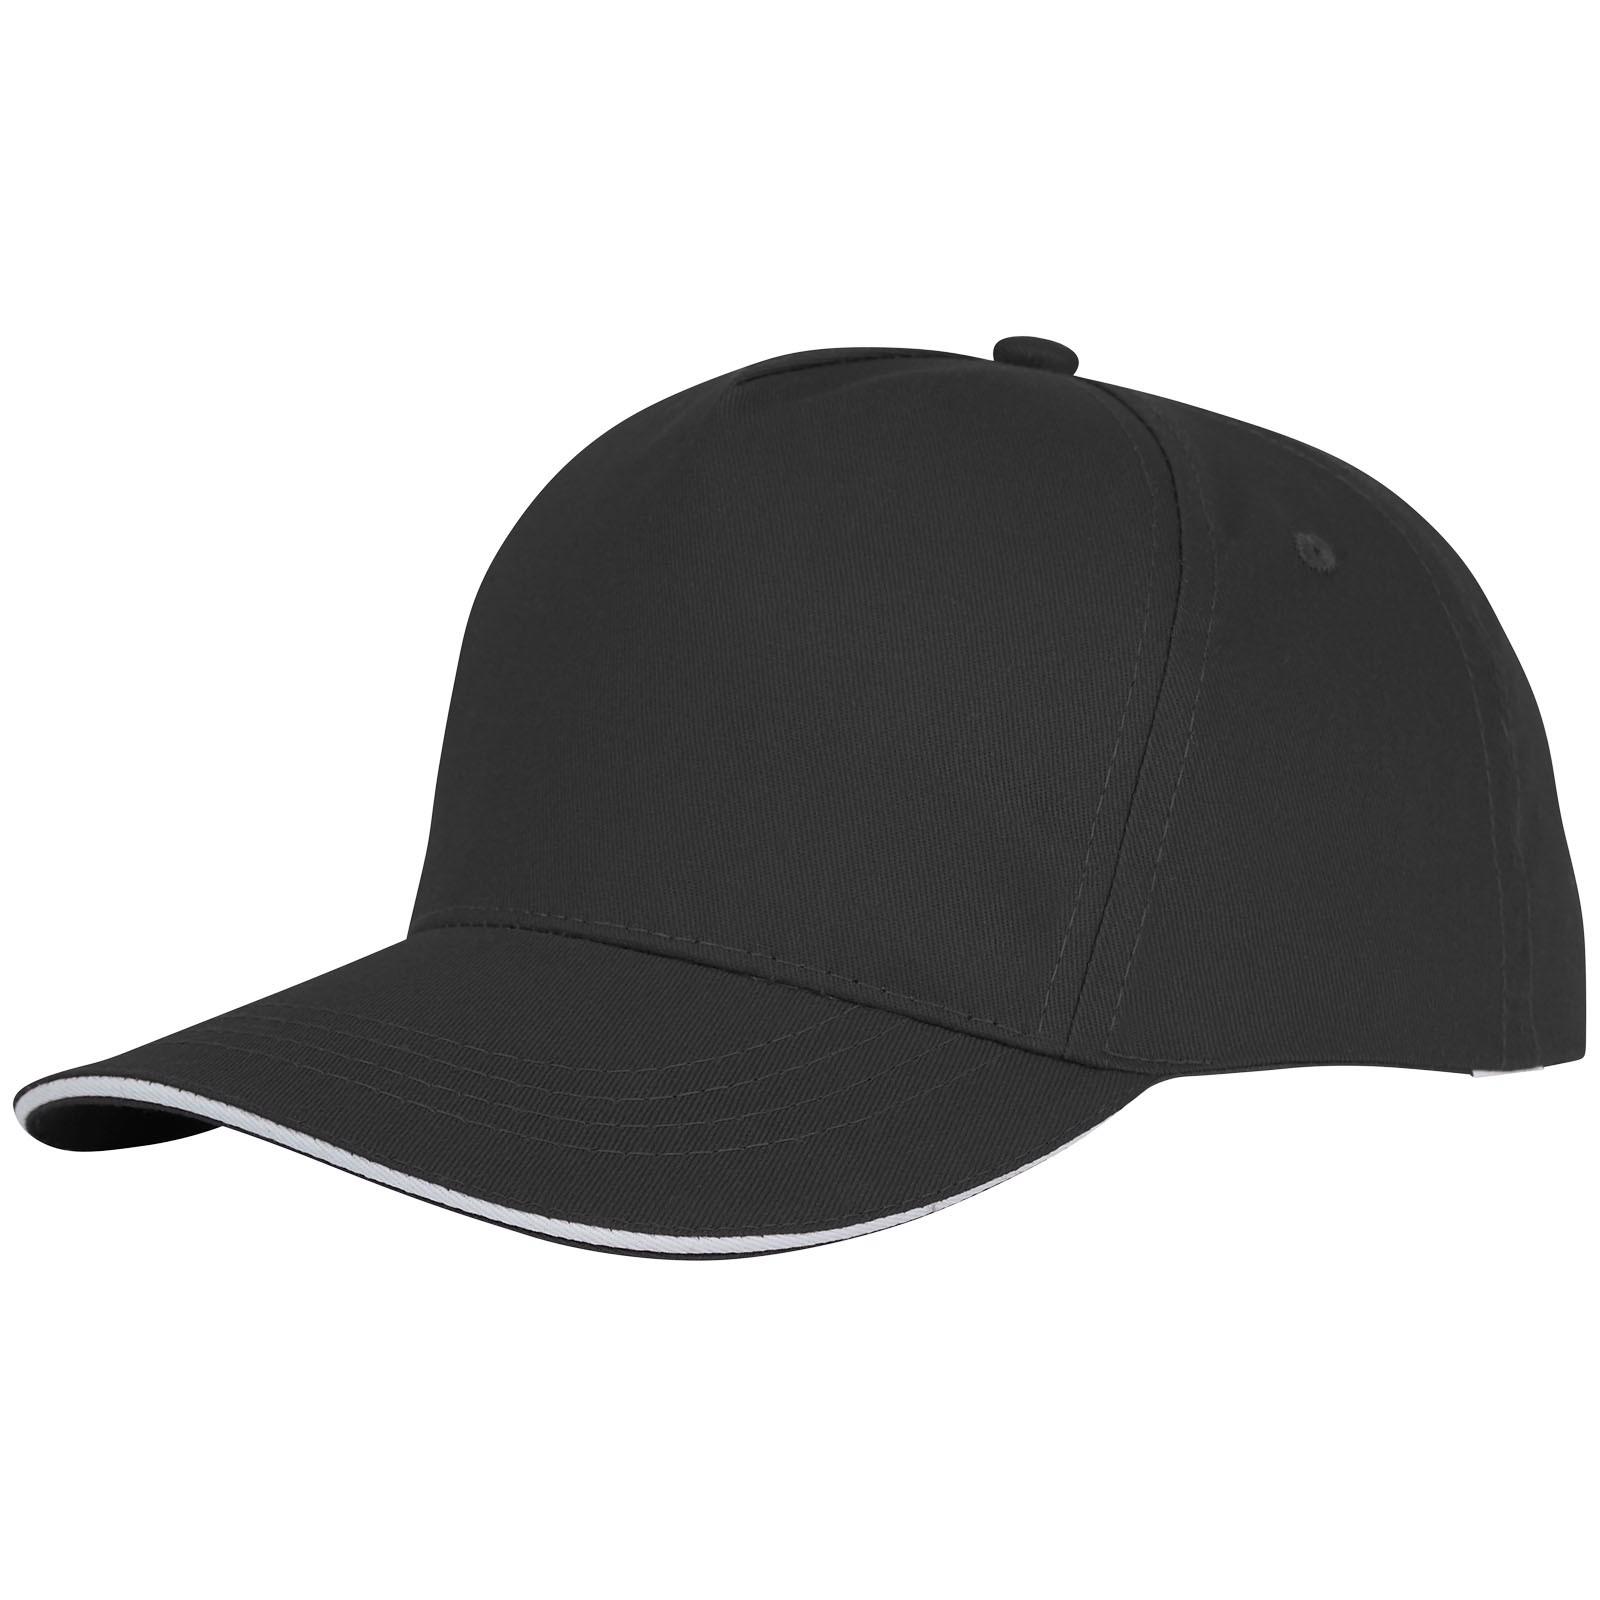 Ceto 5 panel sandwich cap - Solid black